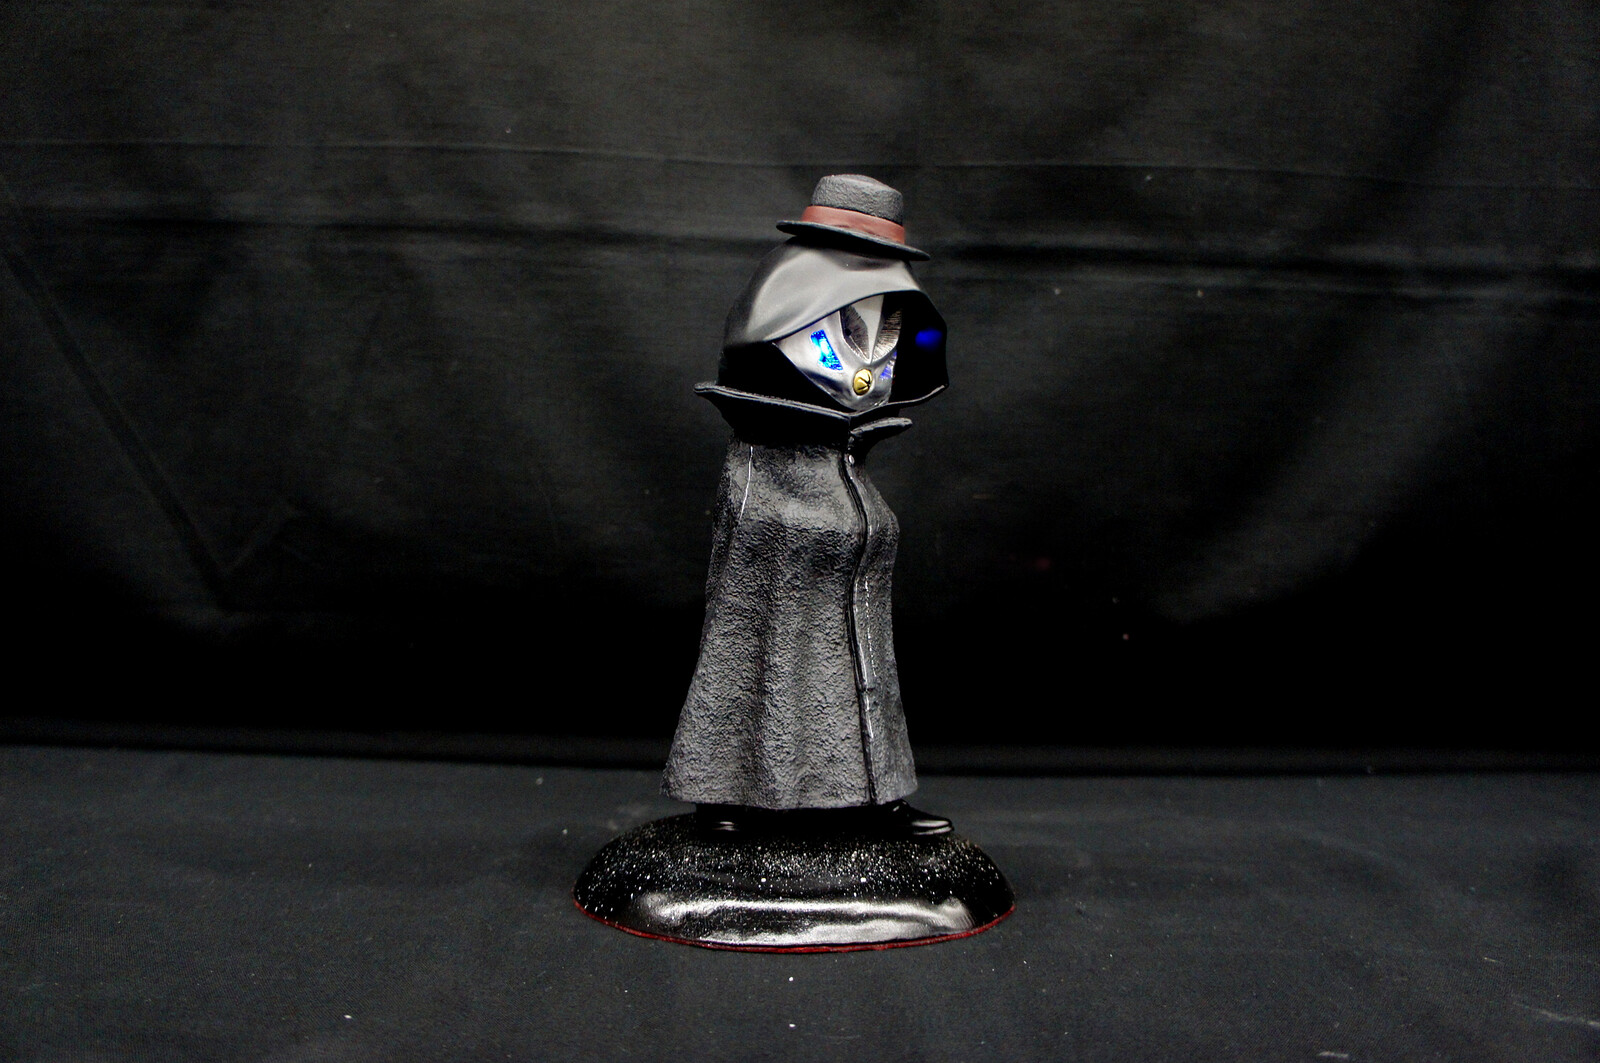 Alien Zarab Disguise ザラブ星人(変装) 完成品 https://www.solidart.club